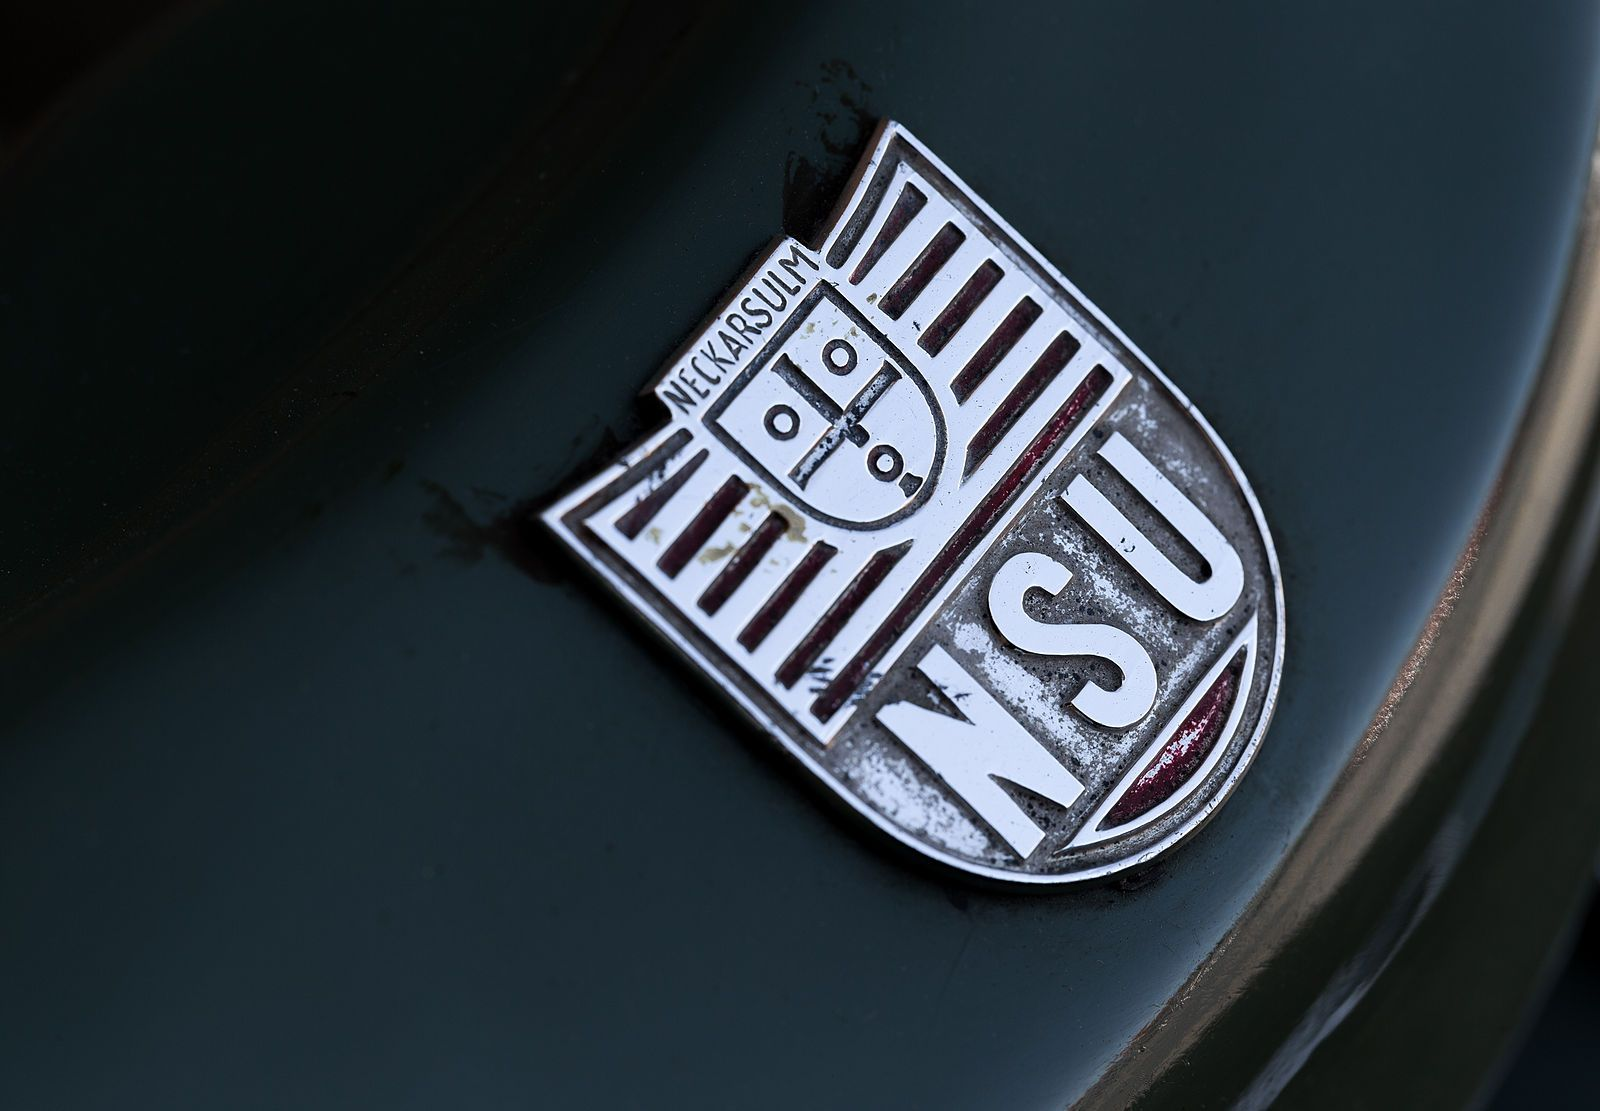 NSU emblem